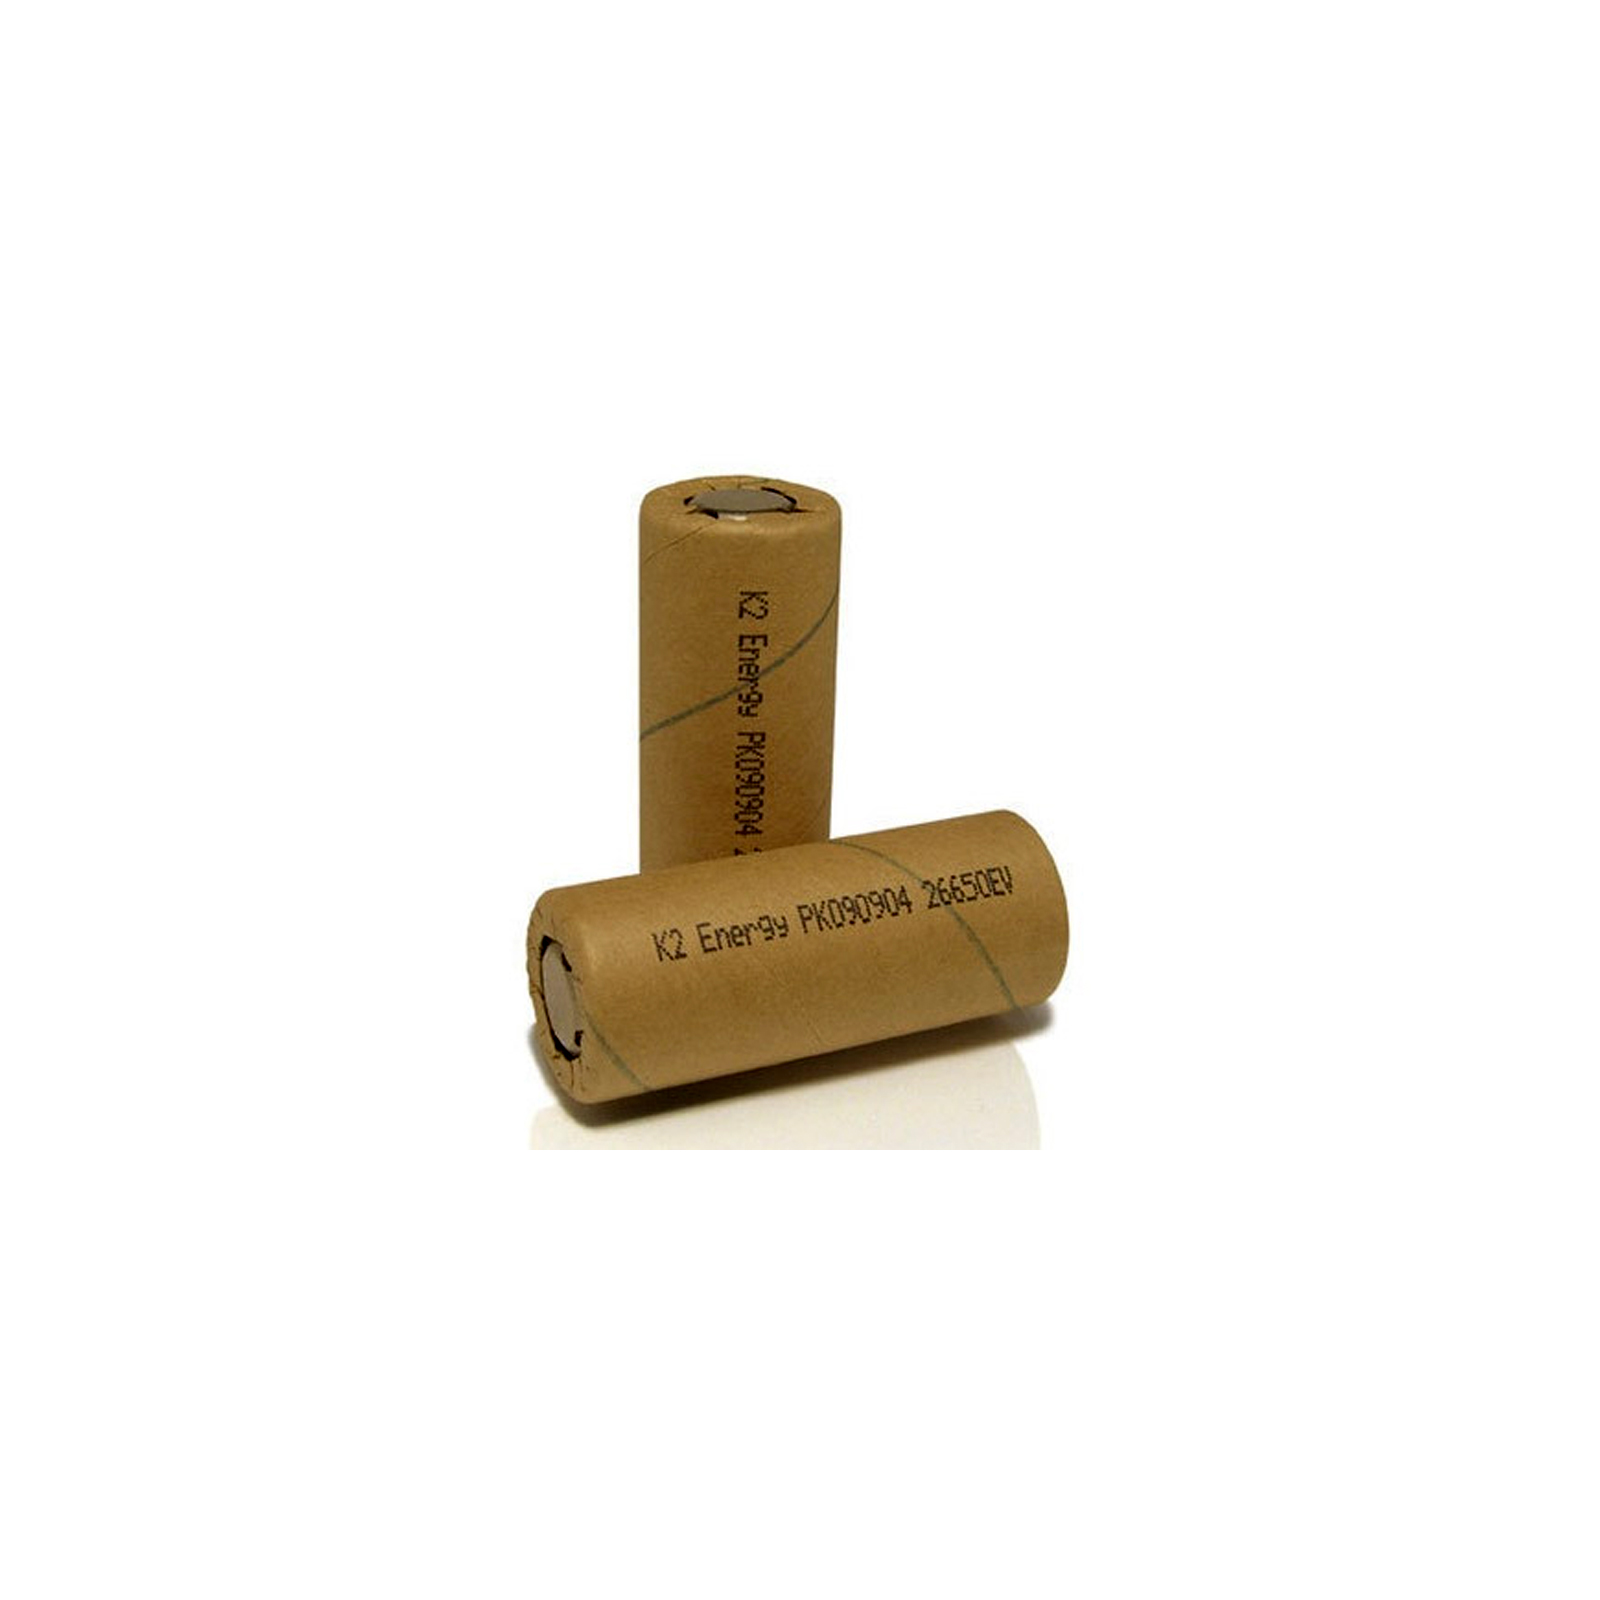 K2 Energy 3.2V LiFePO4 Battery